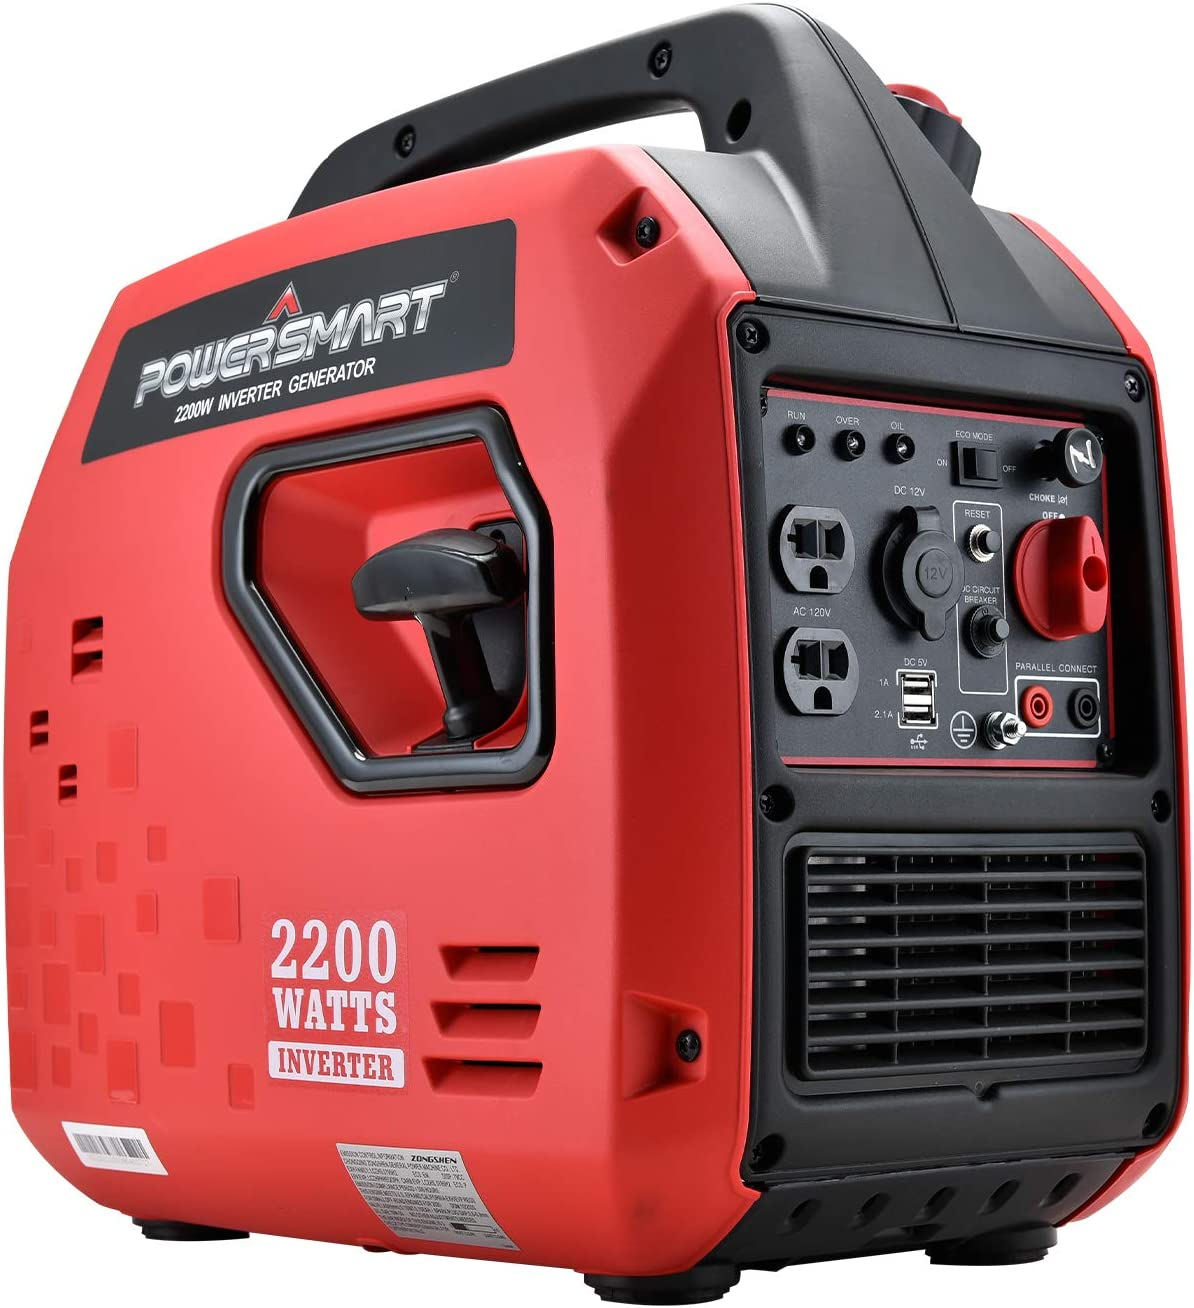 PowerSmart Generator, Super Quiet Generator, 2200 Watts Portable Inverter Generator, Gas Powered Generator, Fuel Shut Off, CARB Compliant Red/Black, PS5025